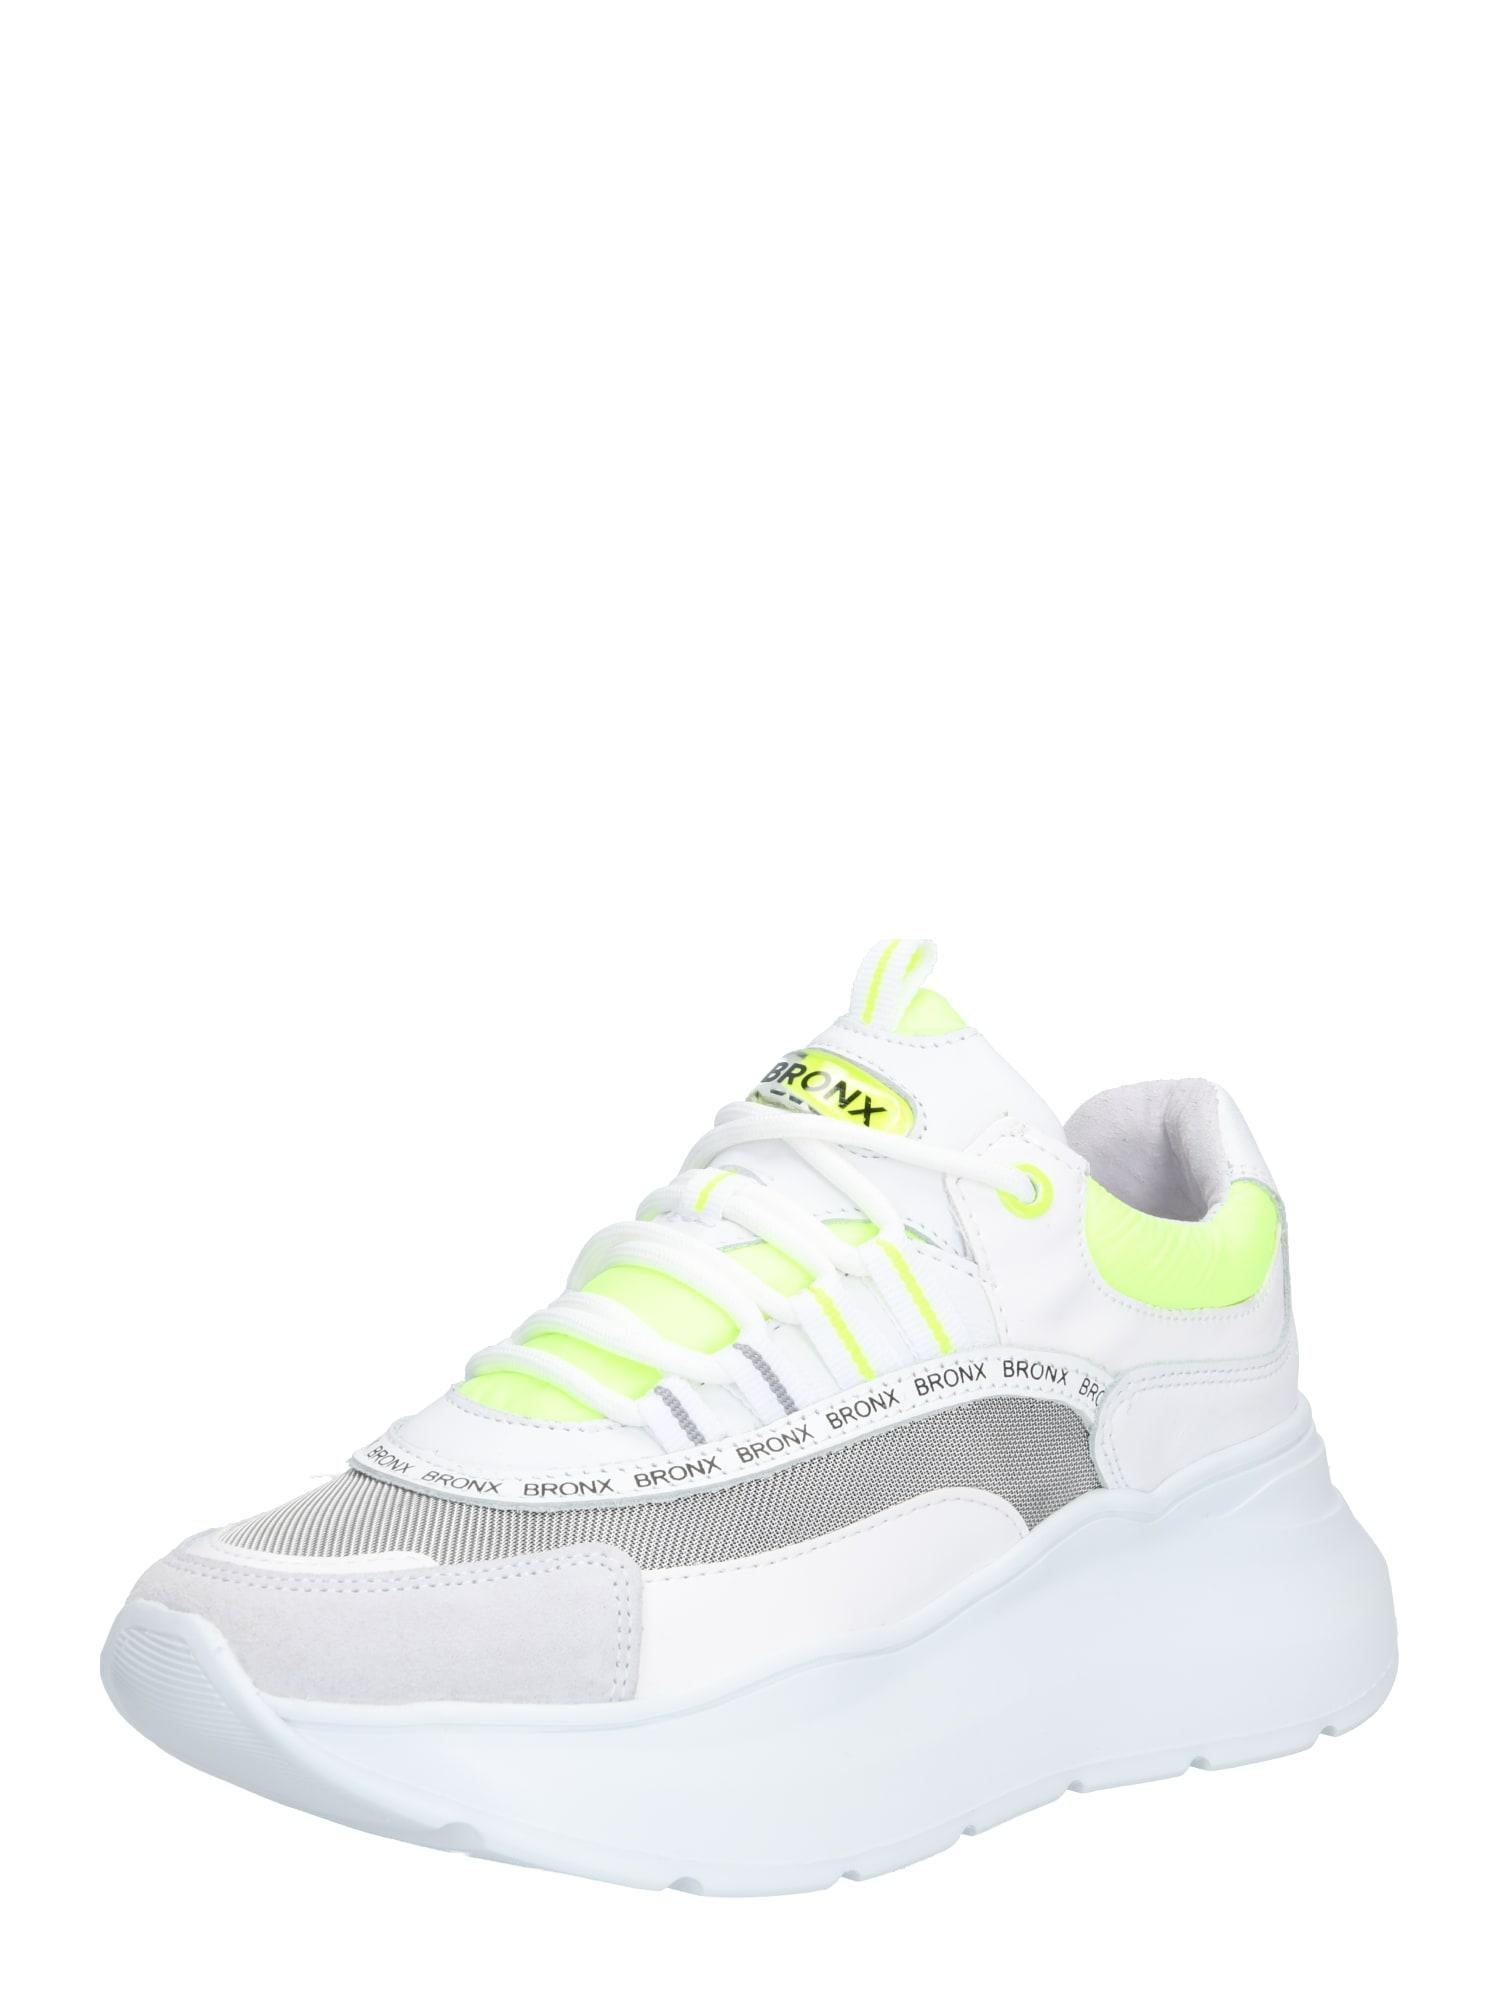 Tenisky Grayson žlutá šedá bílá BRONX